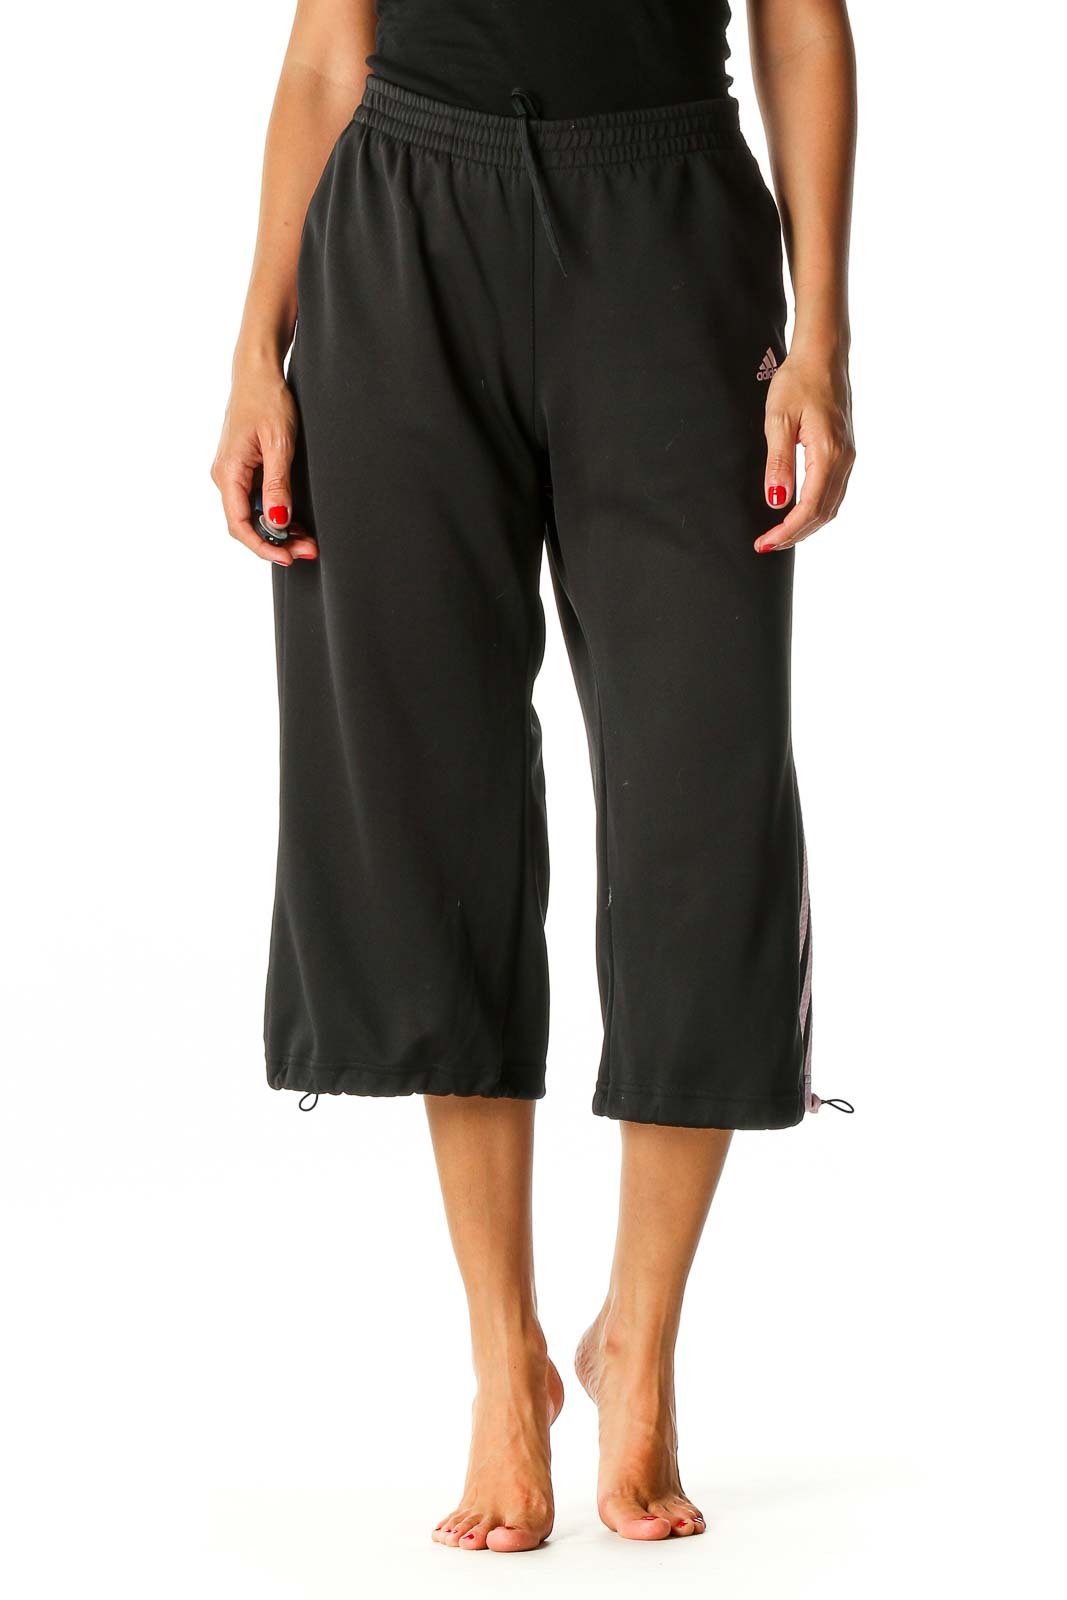 Black Colorblock Activewear Culottes Pants Front